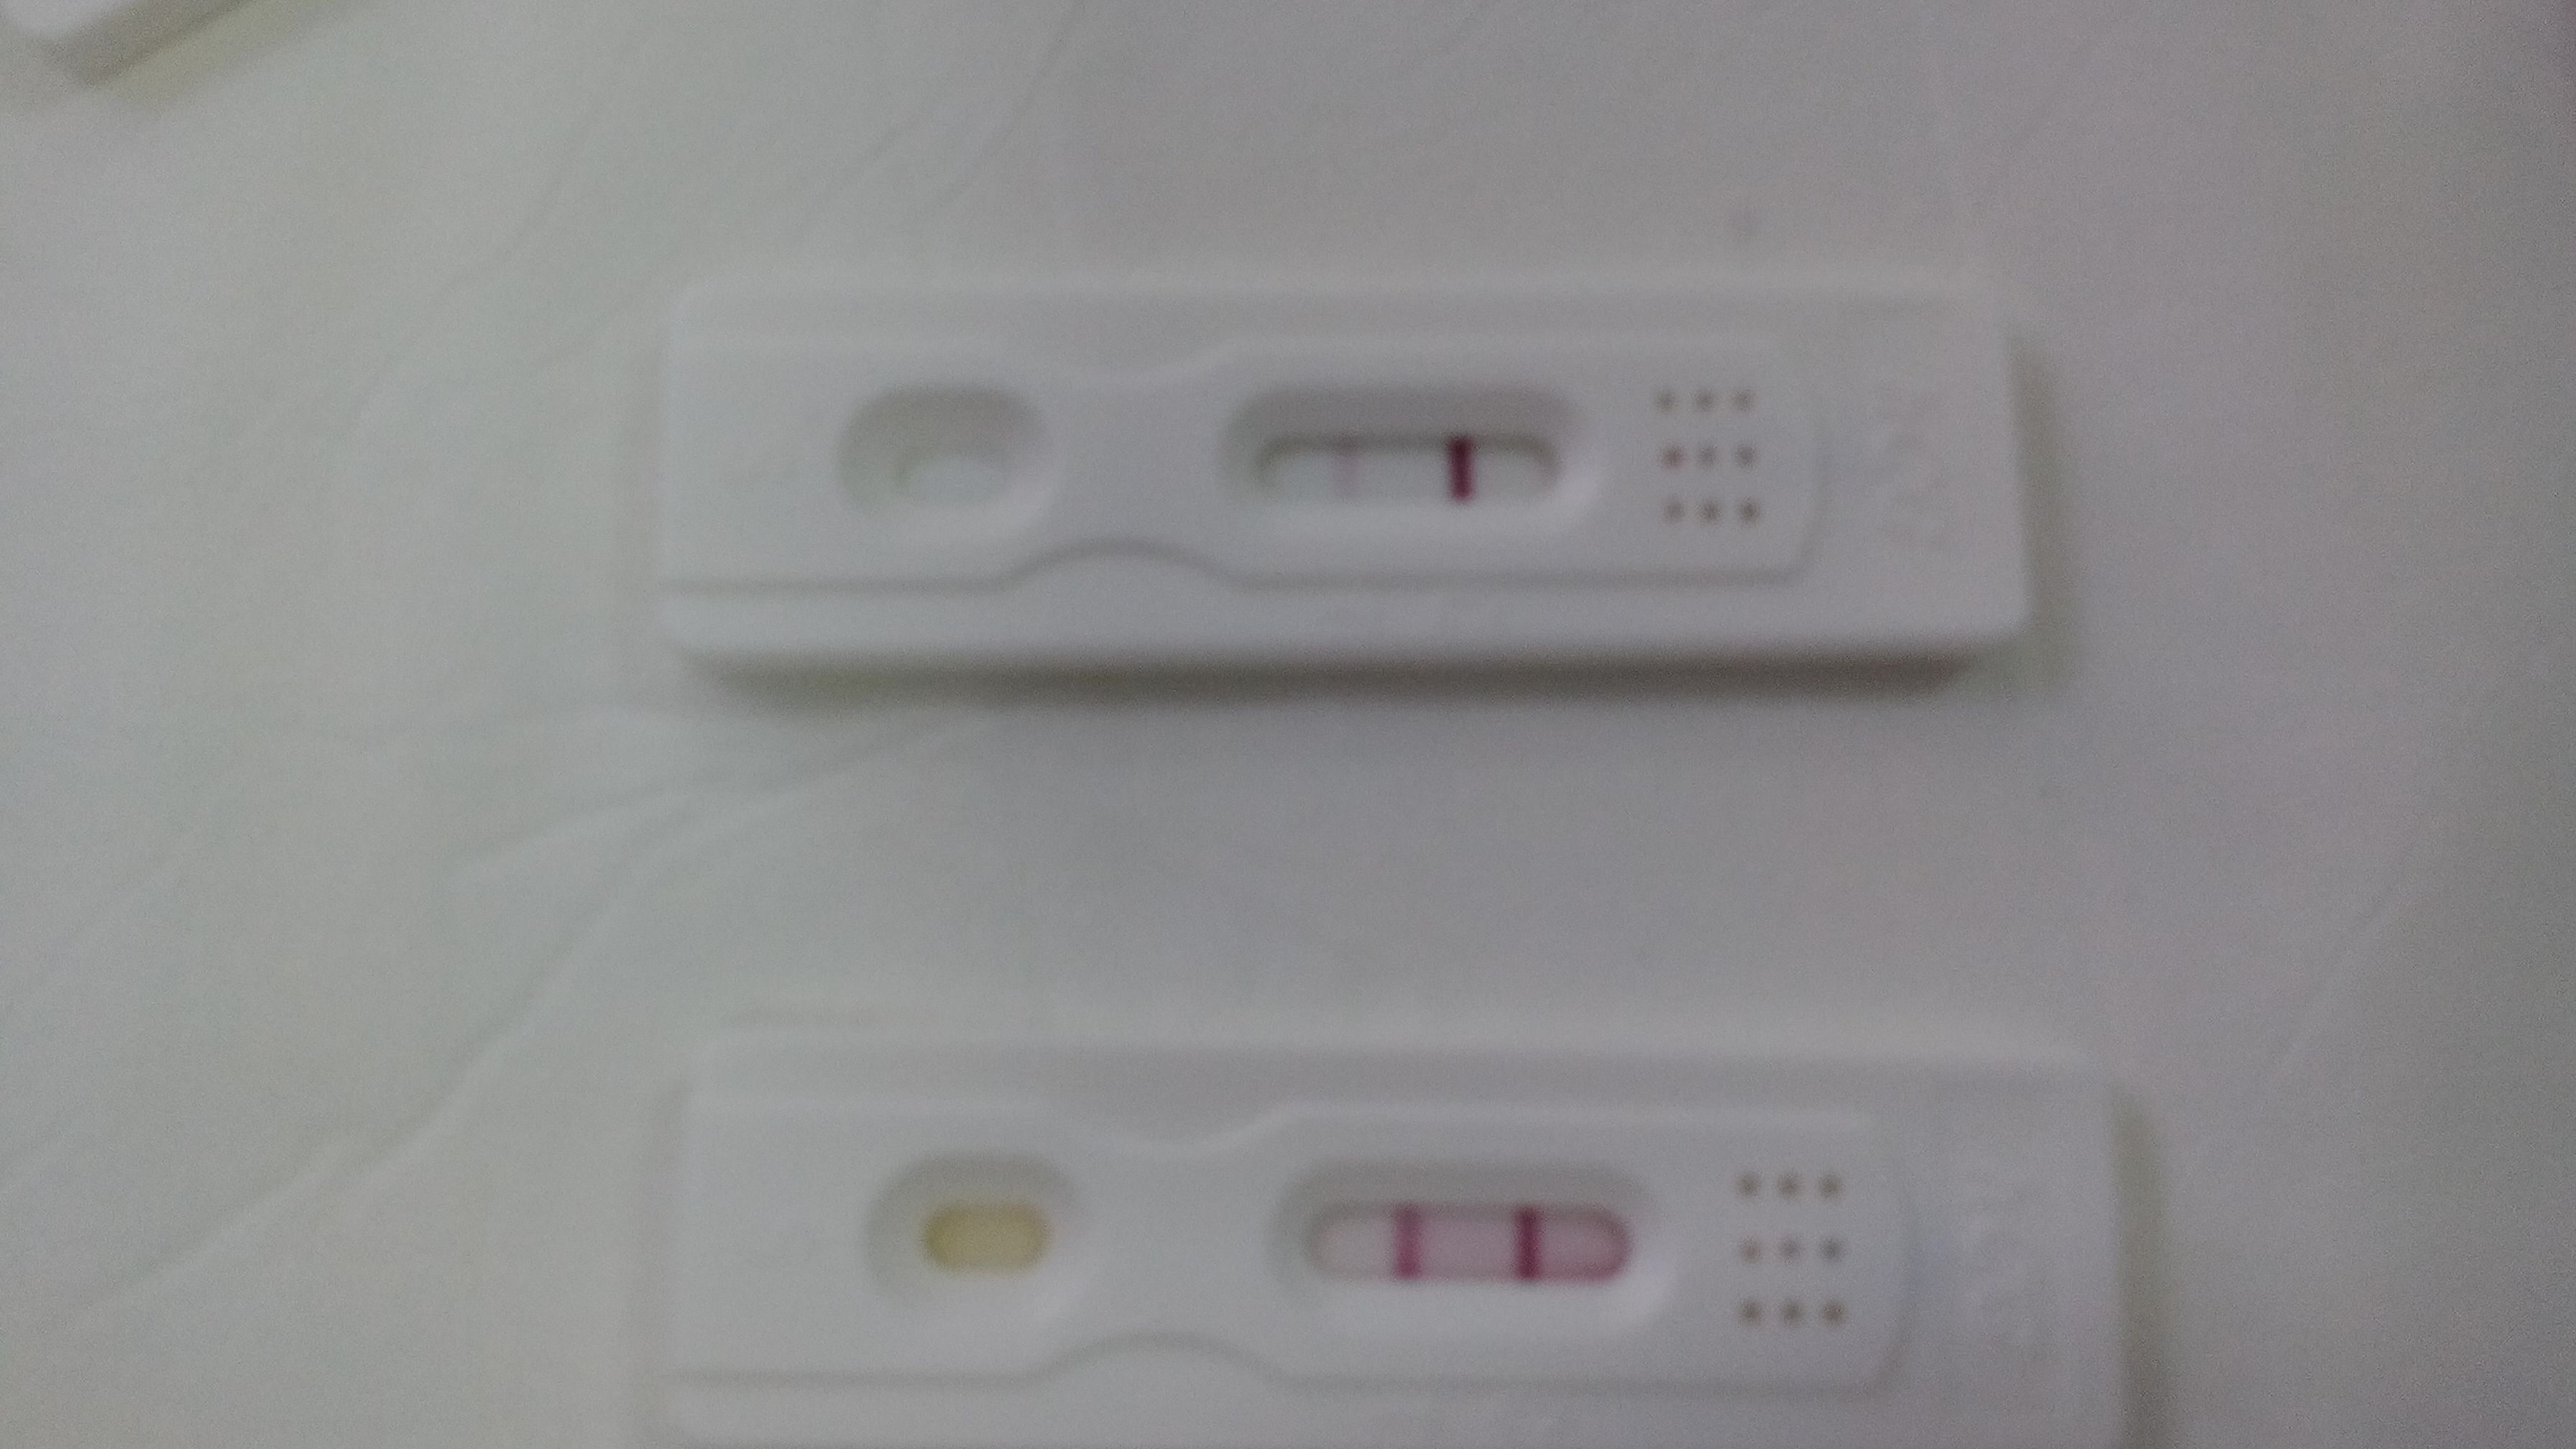 Debil test de embarazo positivo